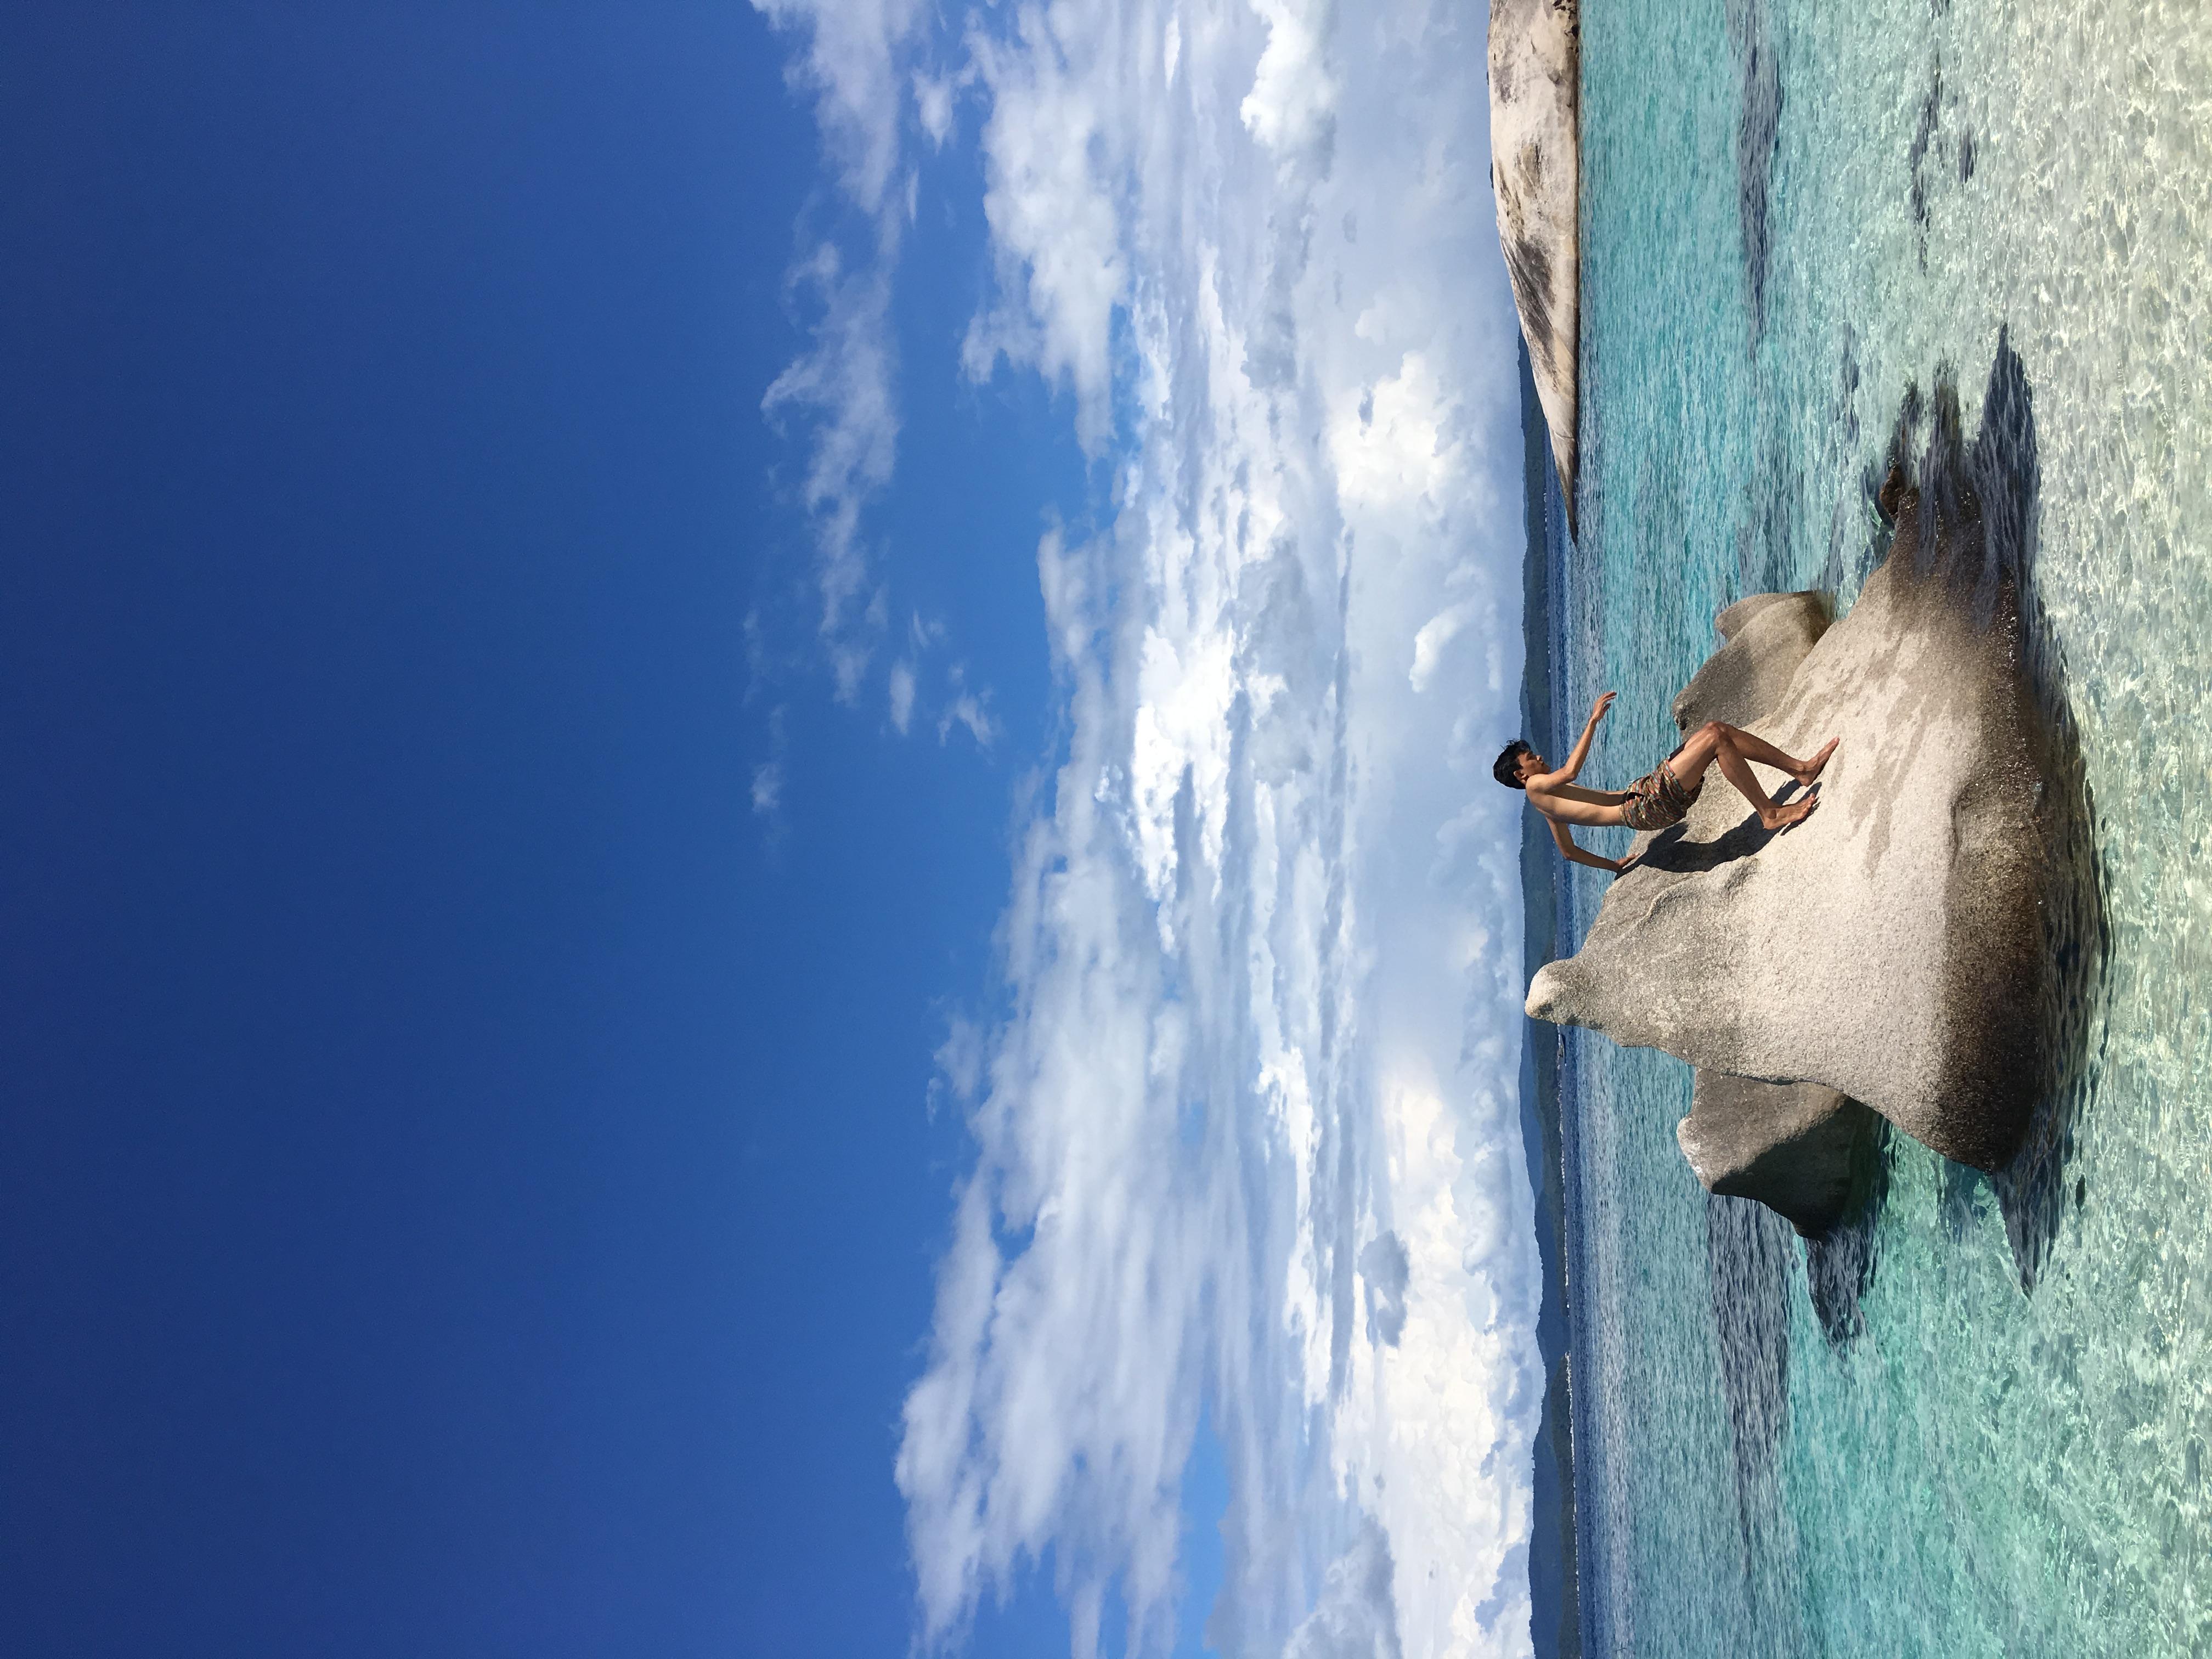 Wisata Ke Pulau Bawah (The Best Asia's Top Five Tropical Island Paradise Cnn.com)